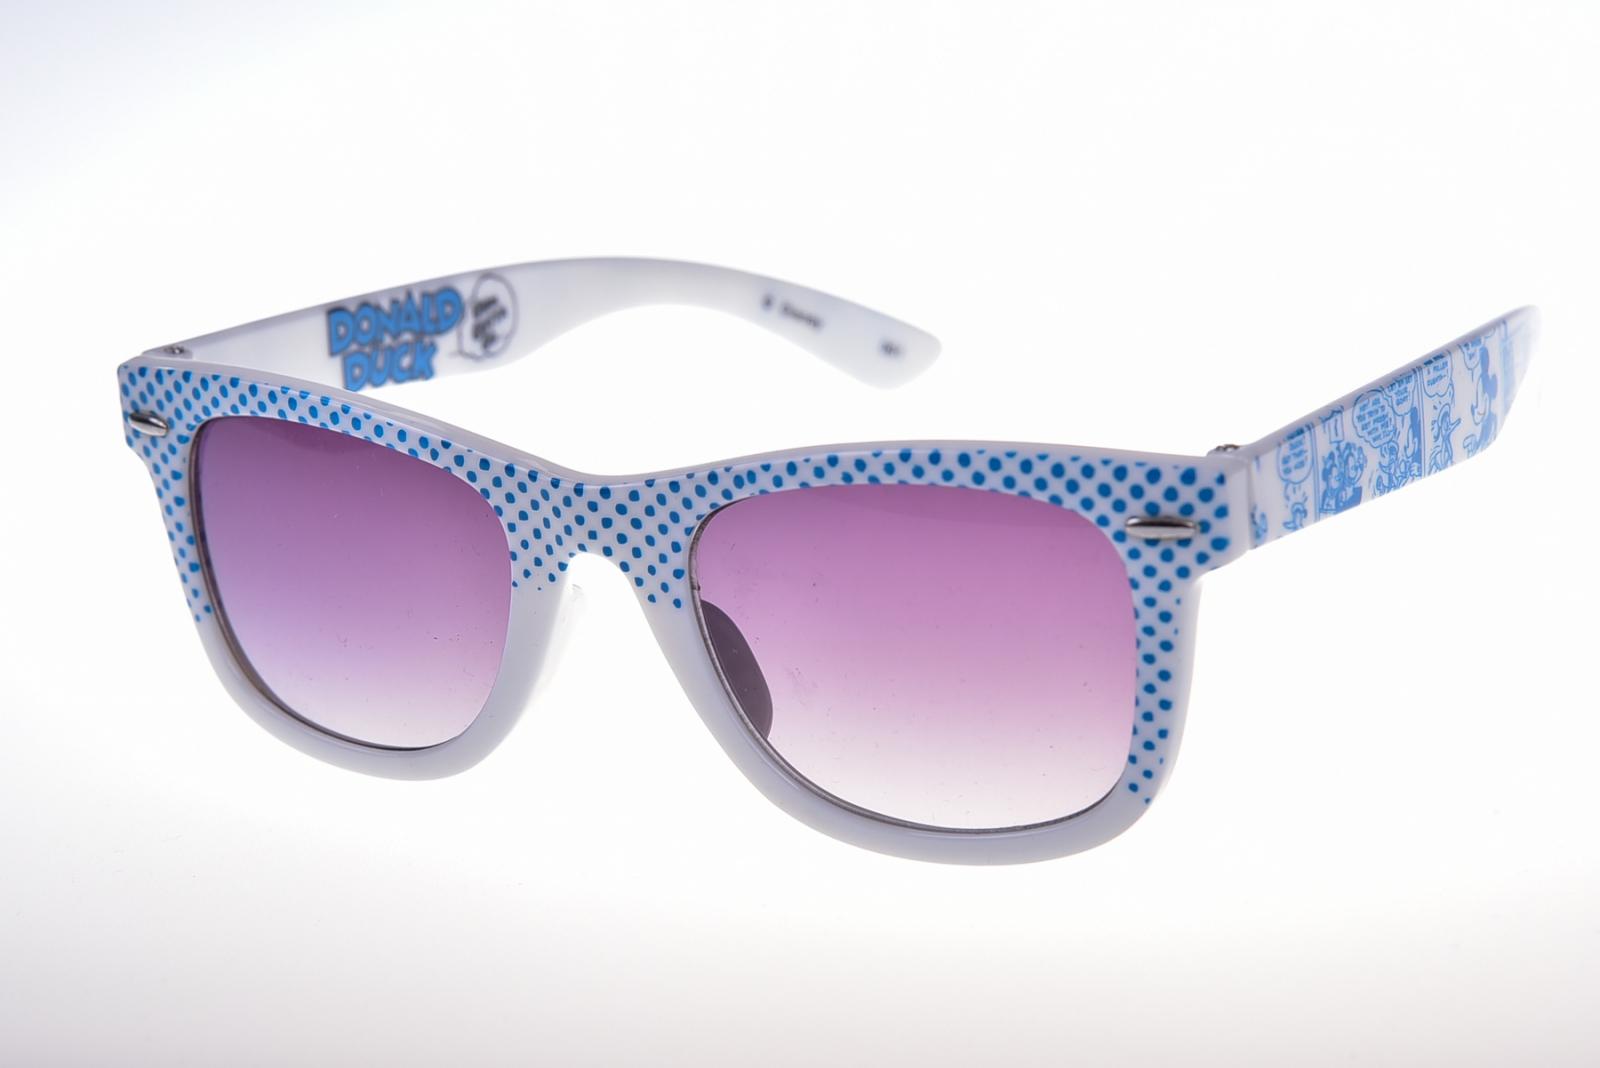 Polaroid Disney D6213B - Slnečné okuliare pre deti 8-12 r.